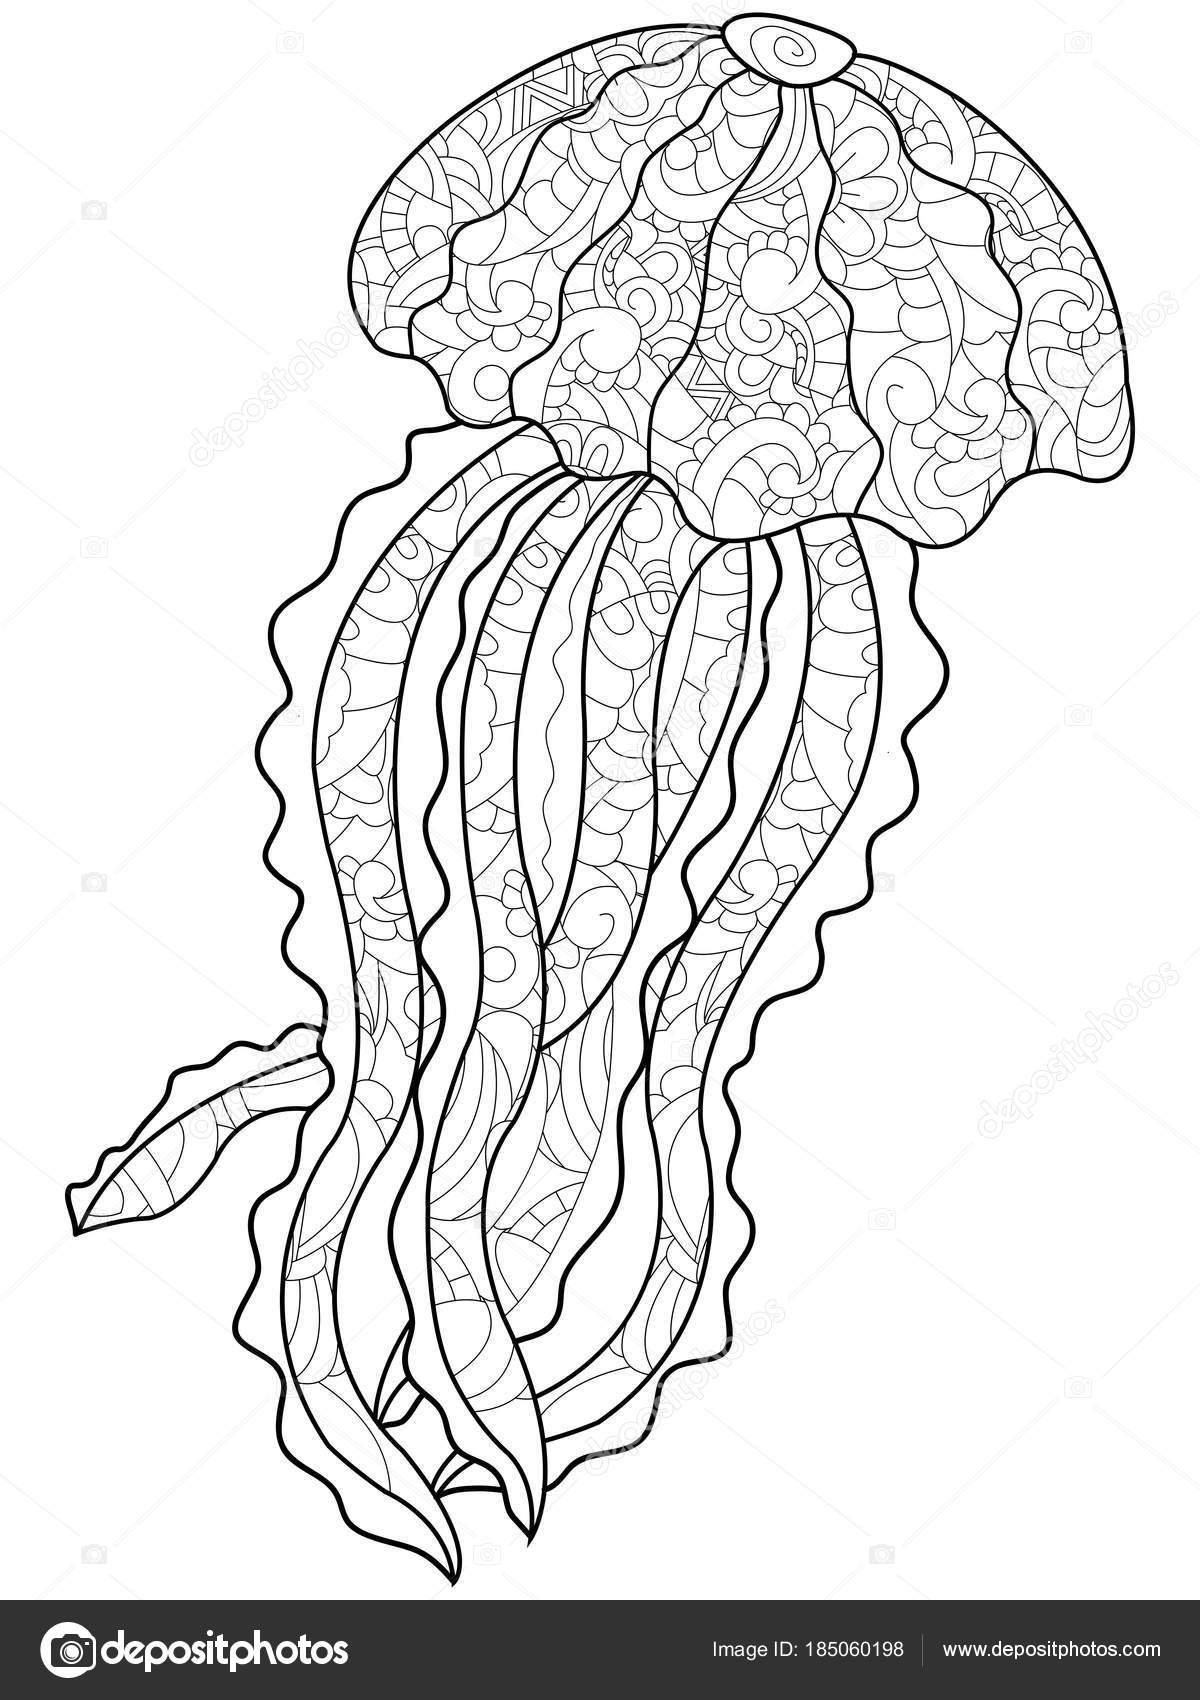 Fotos Medusas Para Imprimir Para Colorear Antiestrés De